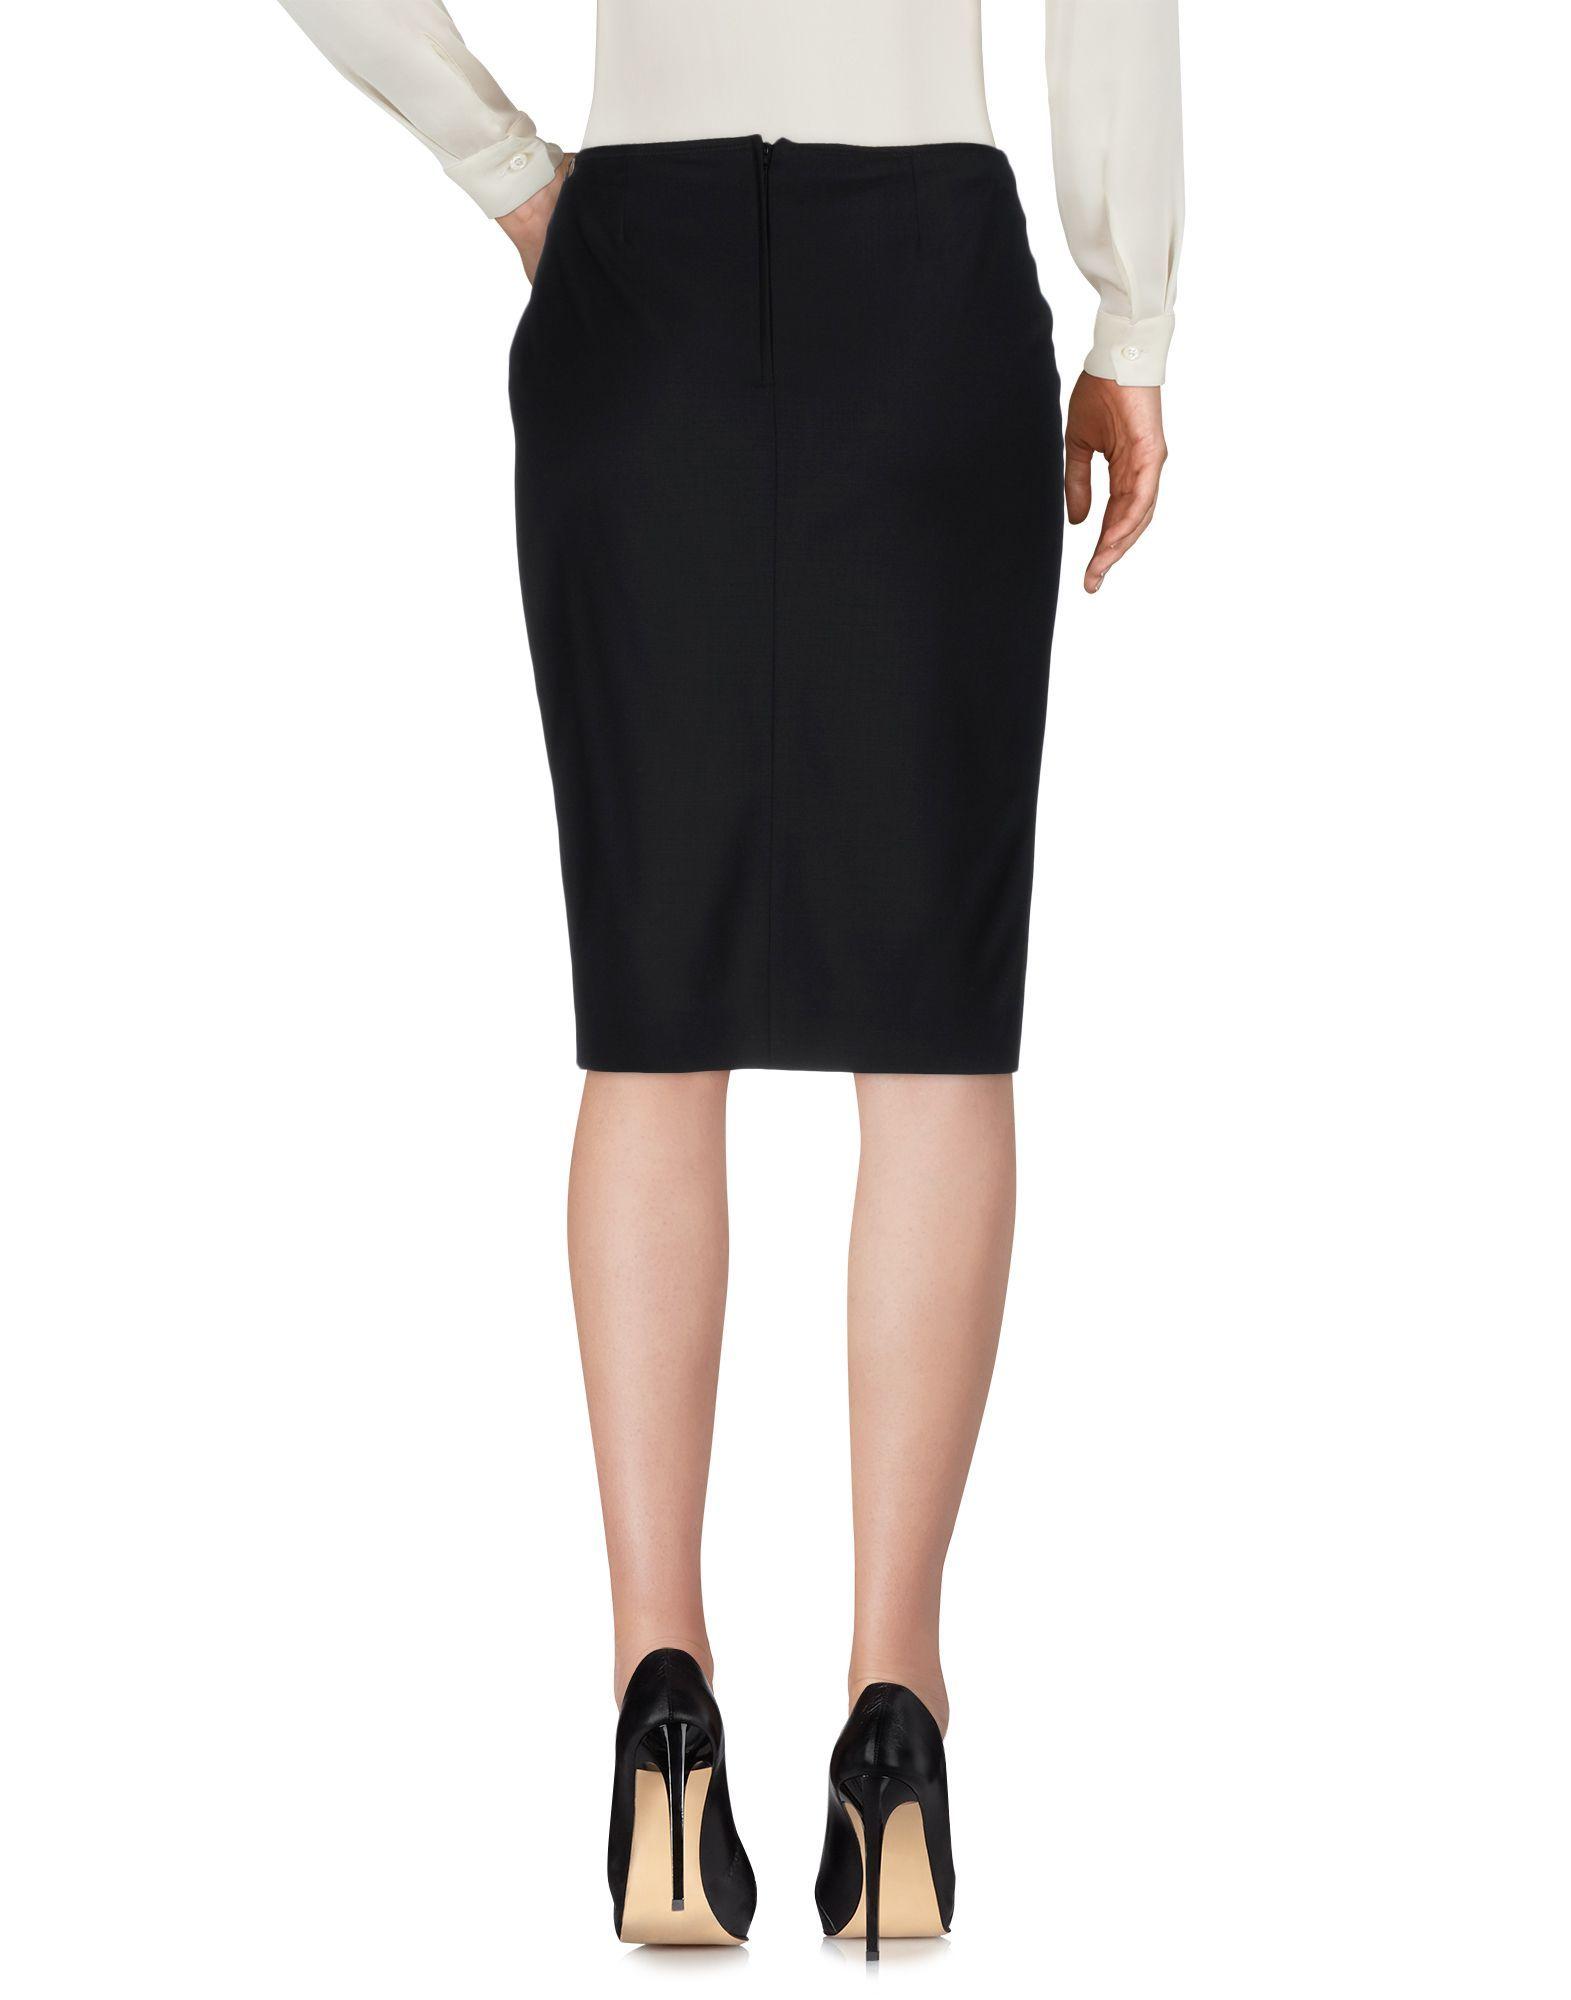 John Richmond Black Virgin Wool Skirt